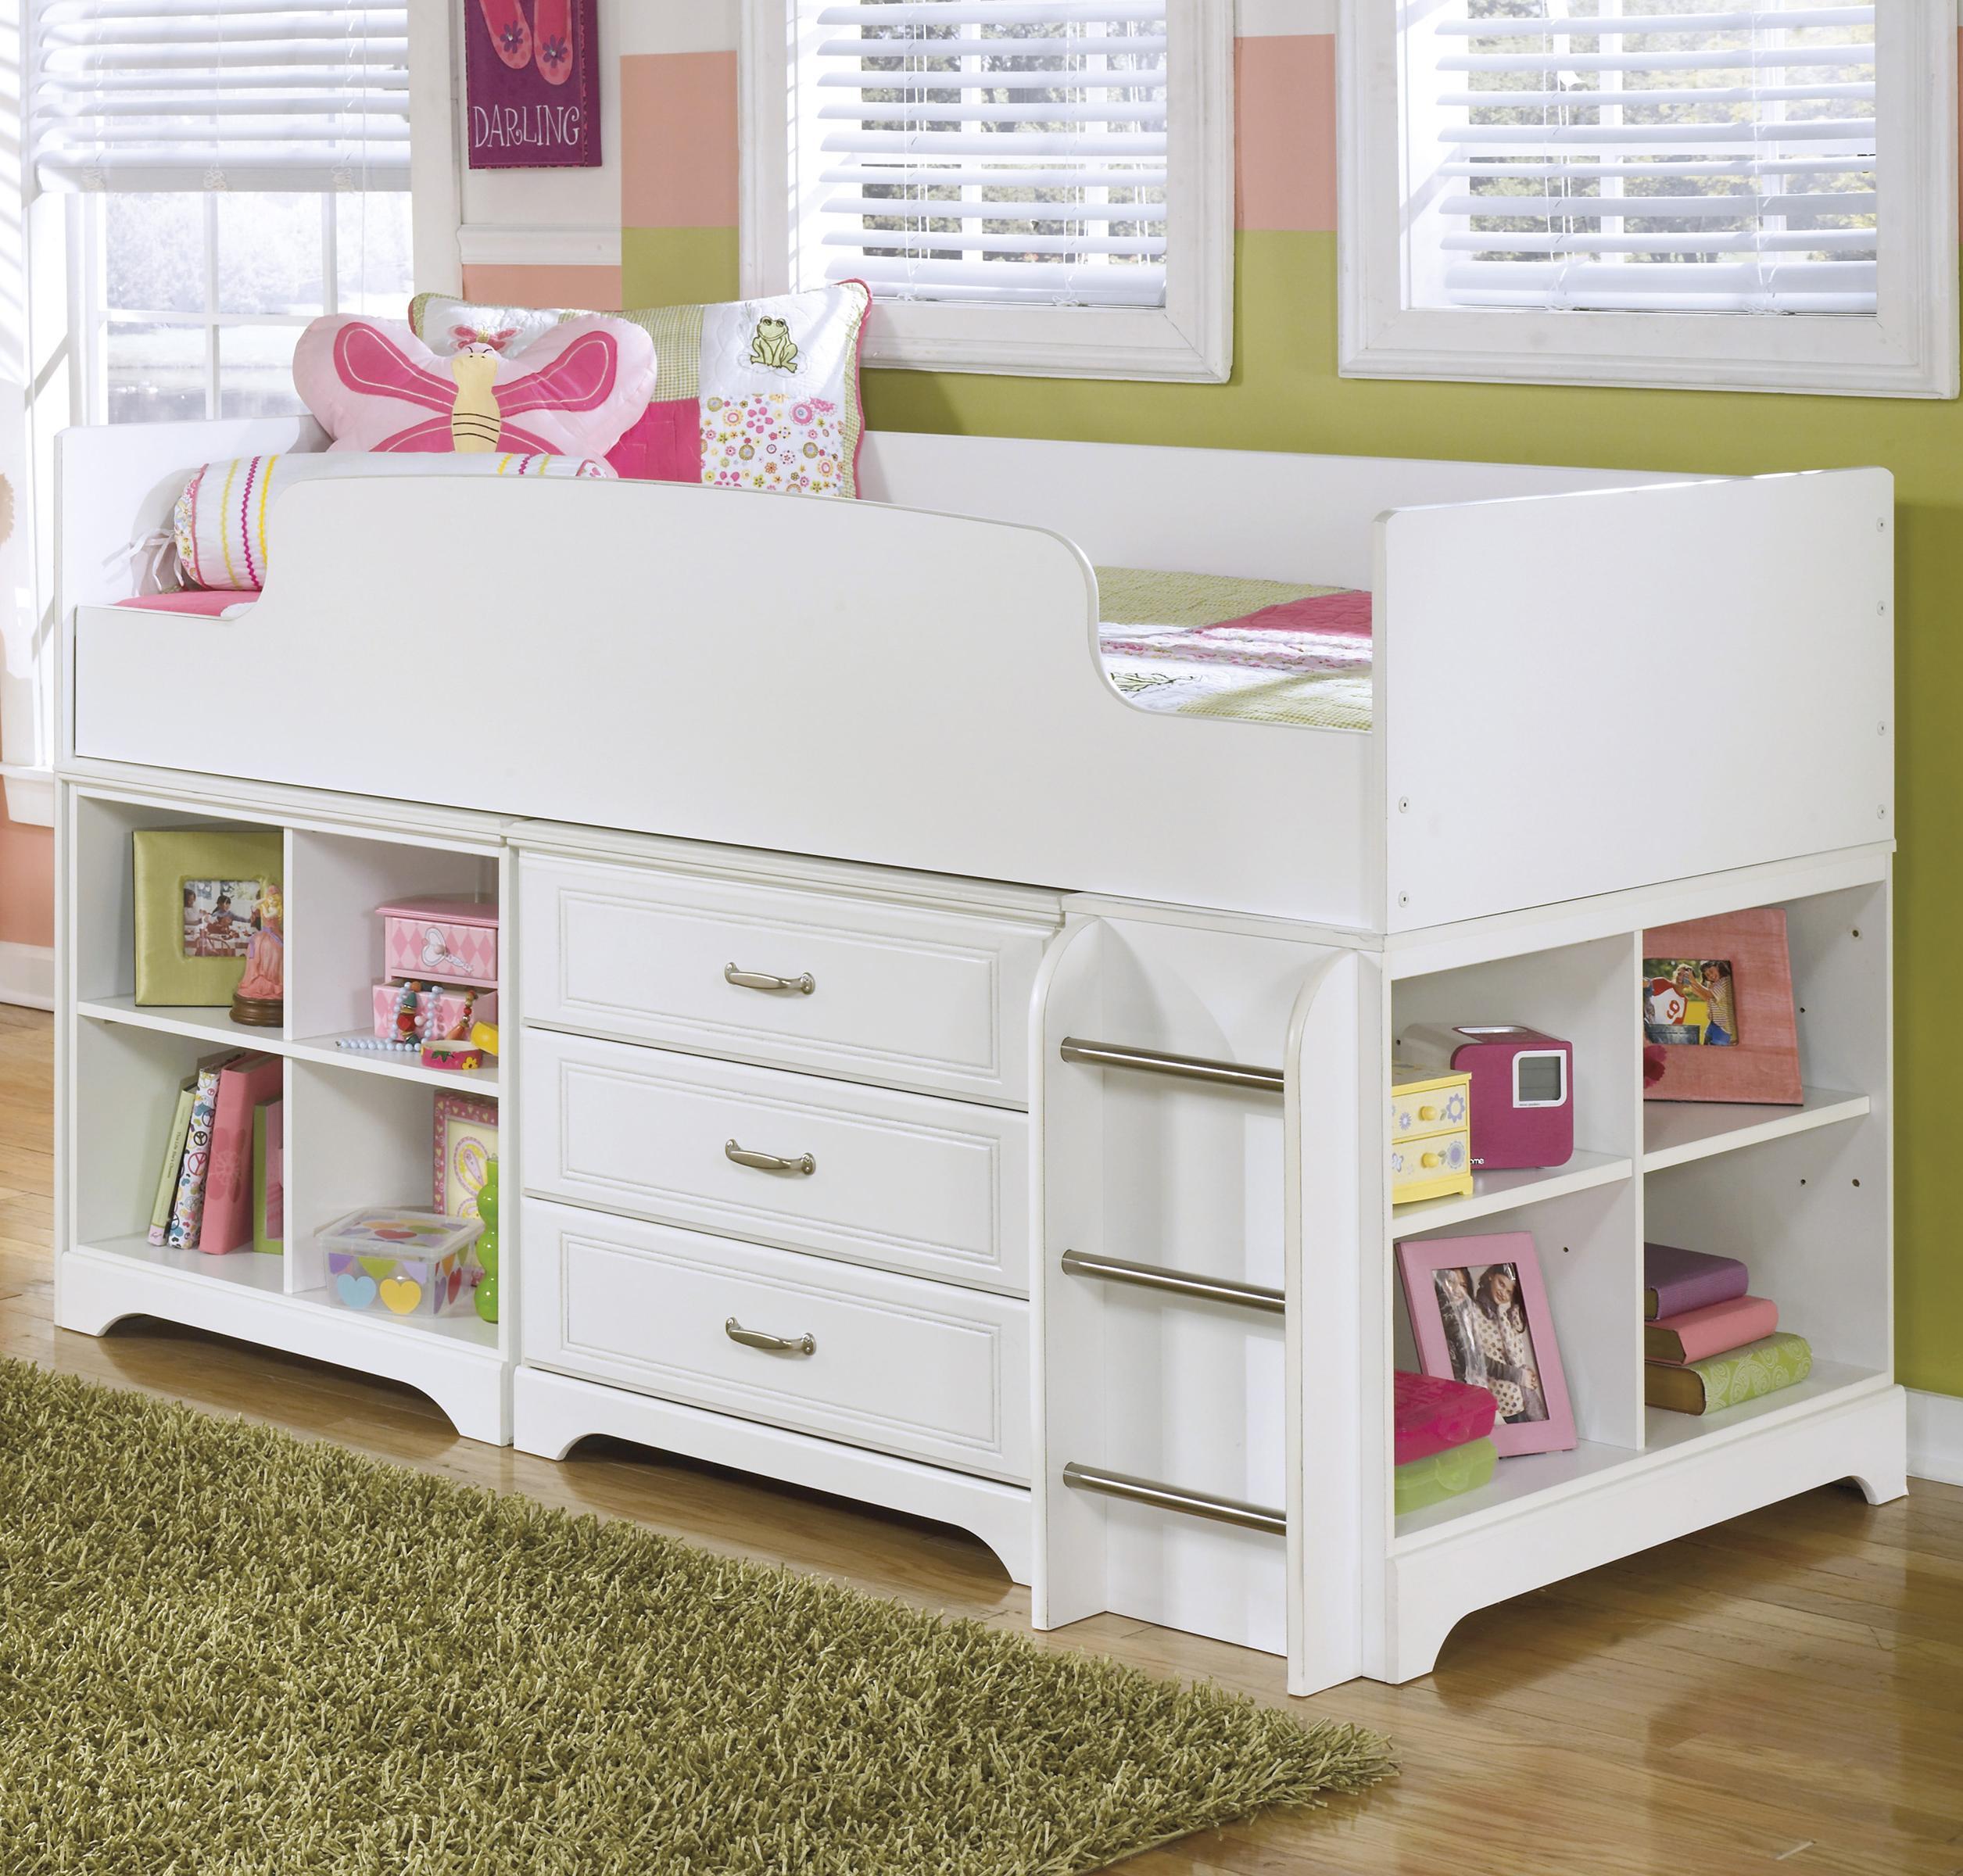 Twin Loft Bed w/ Loft Bin & Drawer Storage